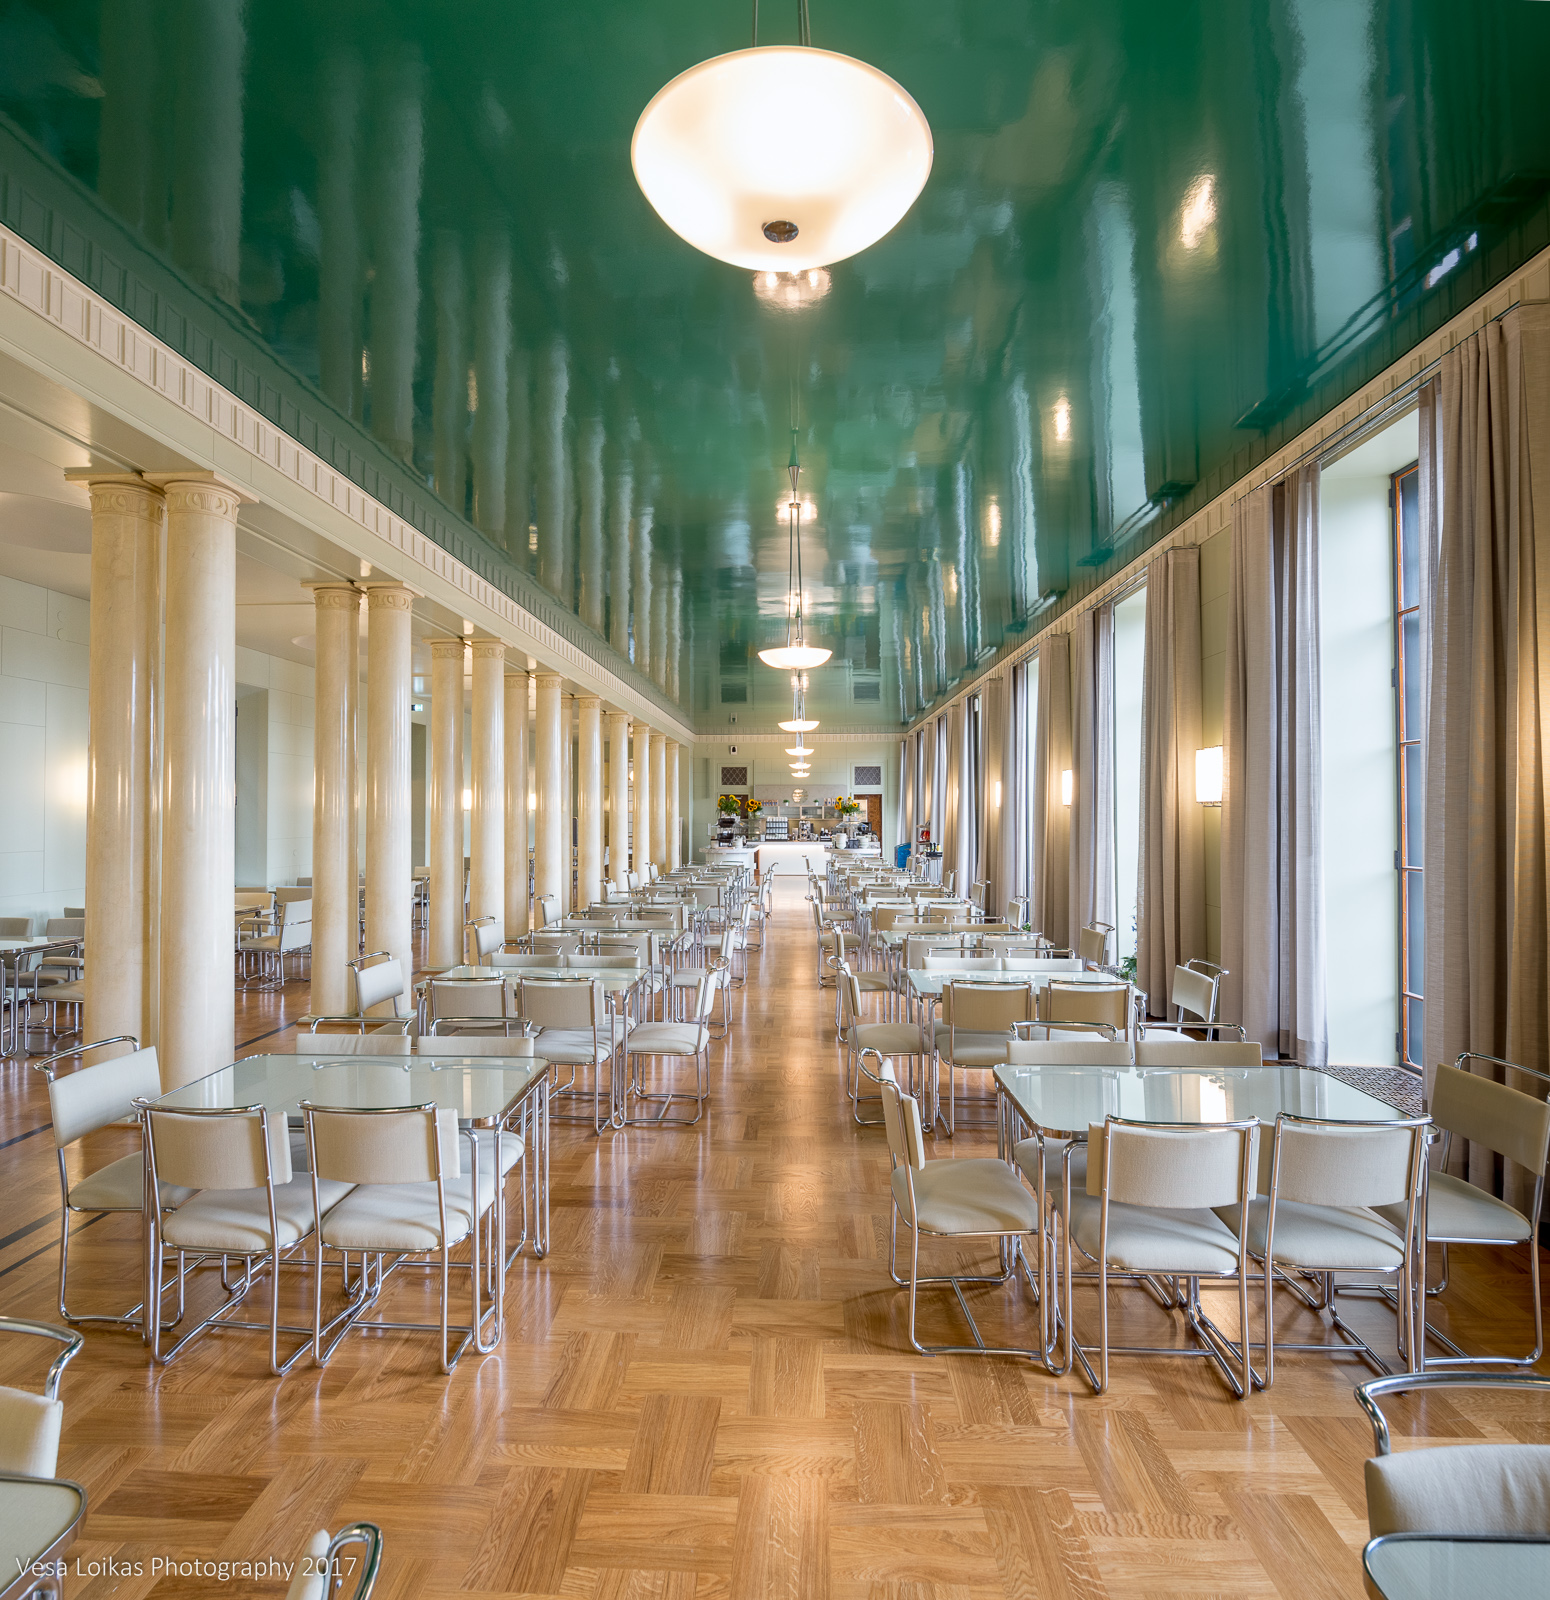 The cafeteria with a mirror-like green ceiling and functionalist furniture. Eduskuntatalon kahvila peilimäisellä vihreällä katolla.